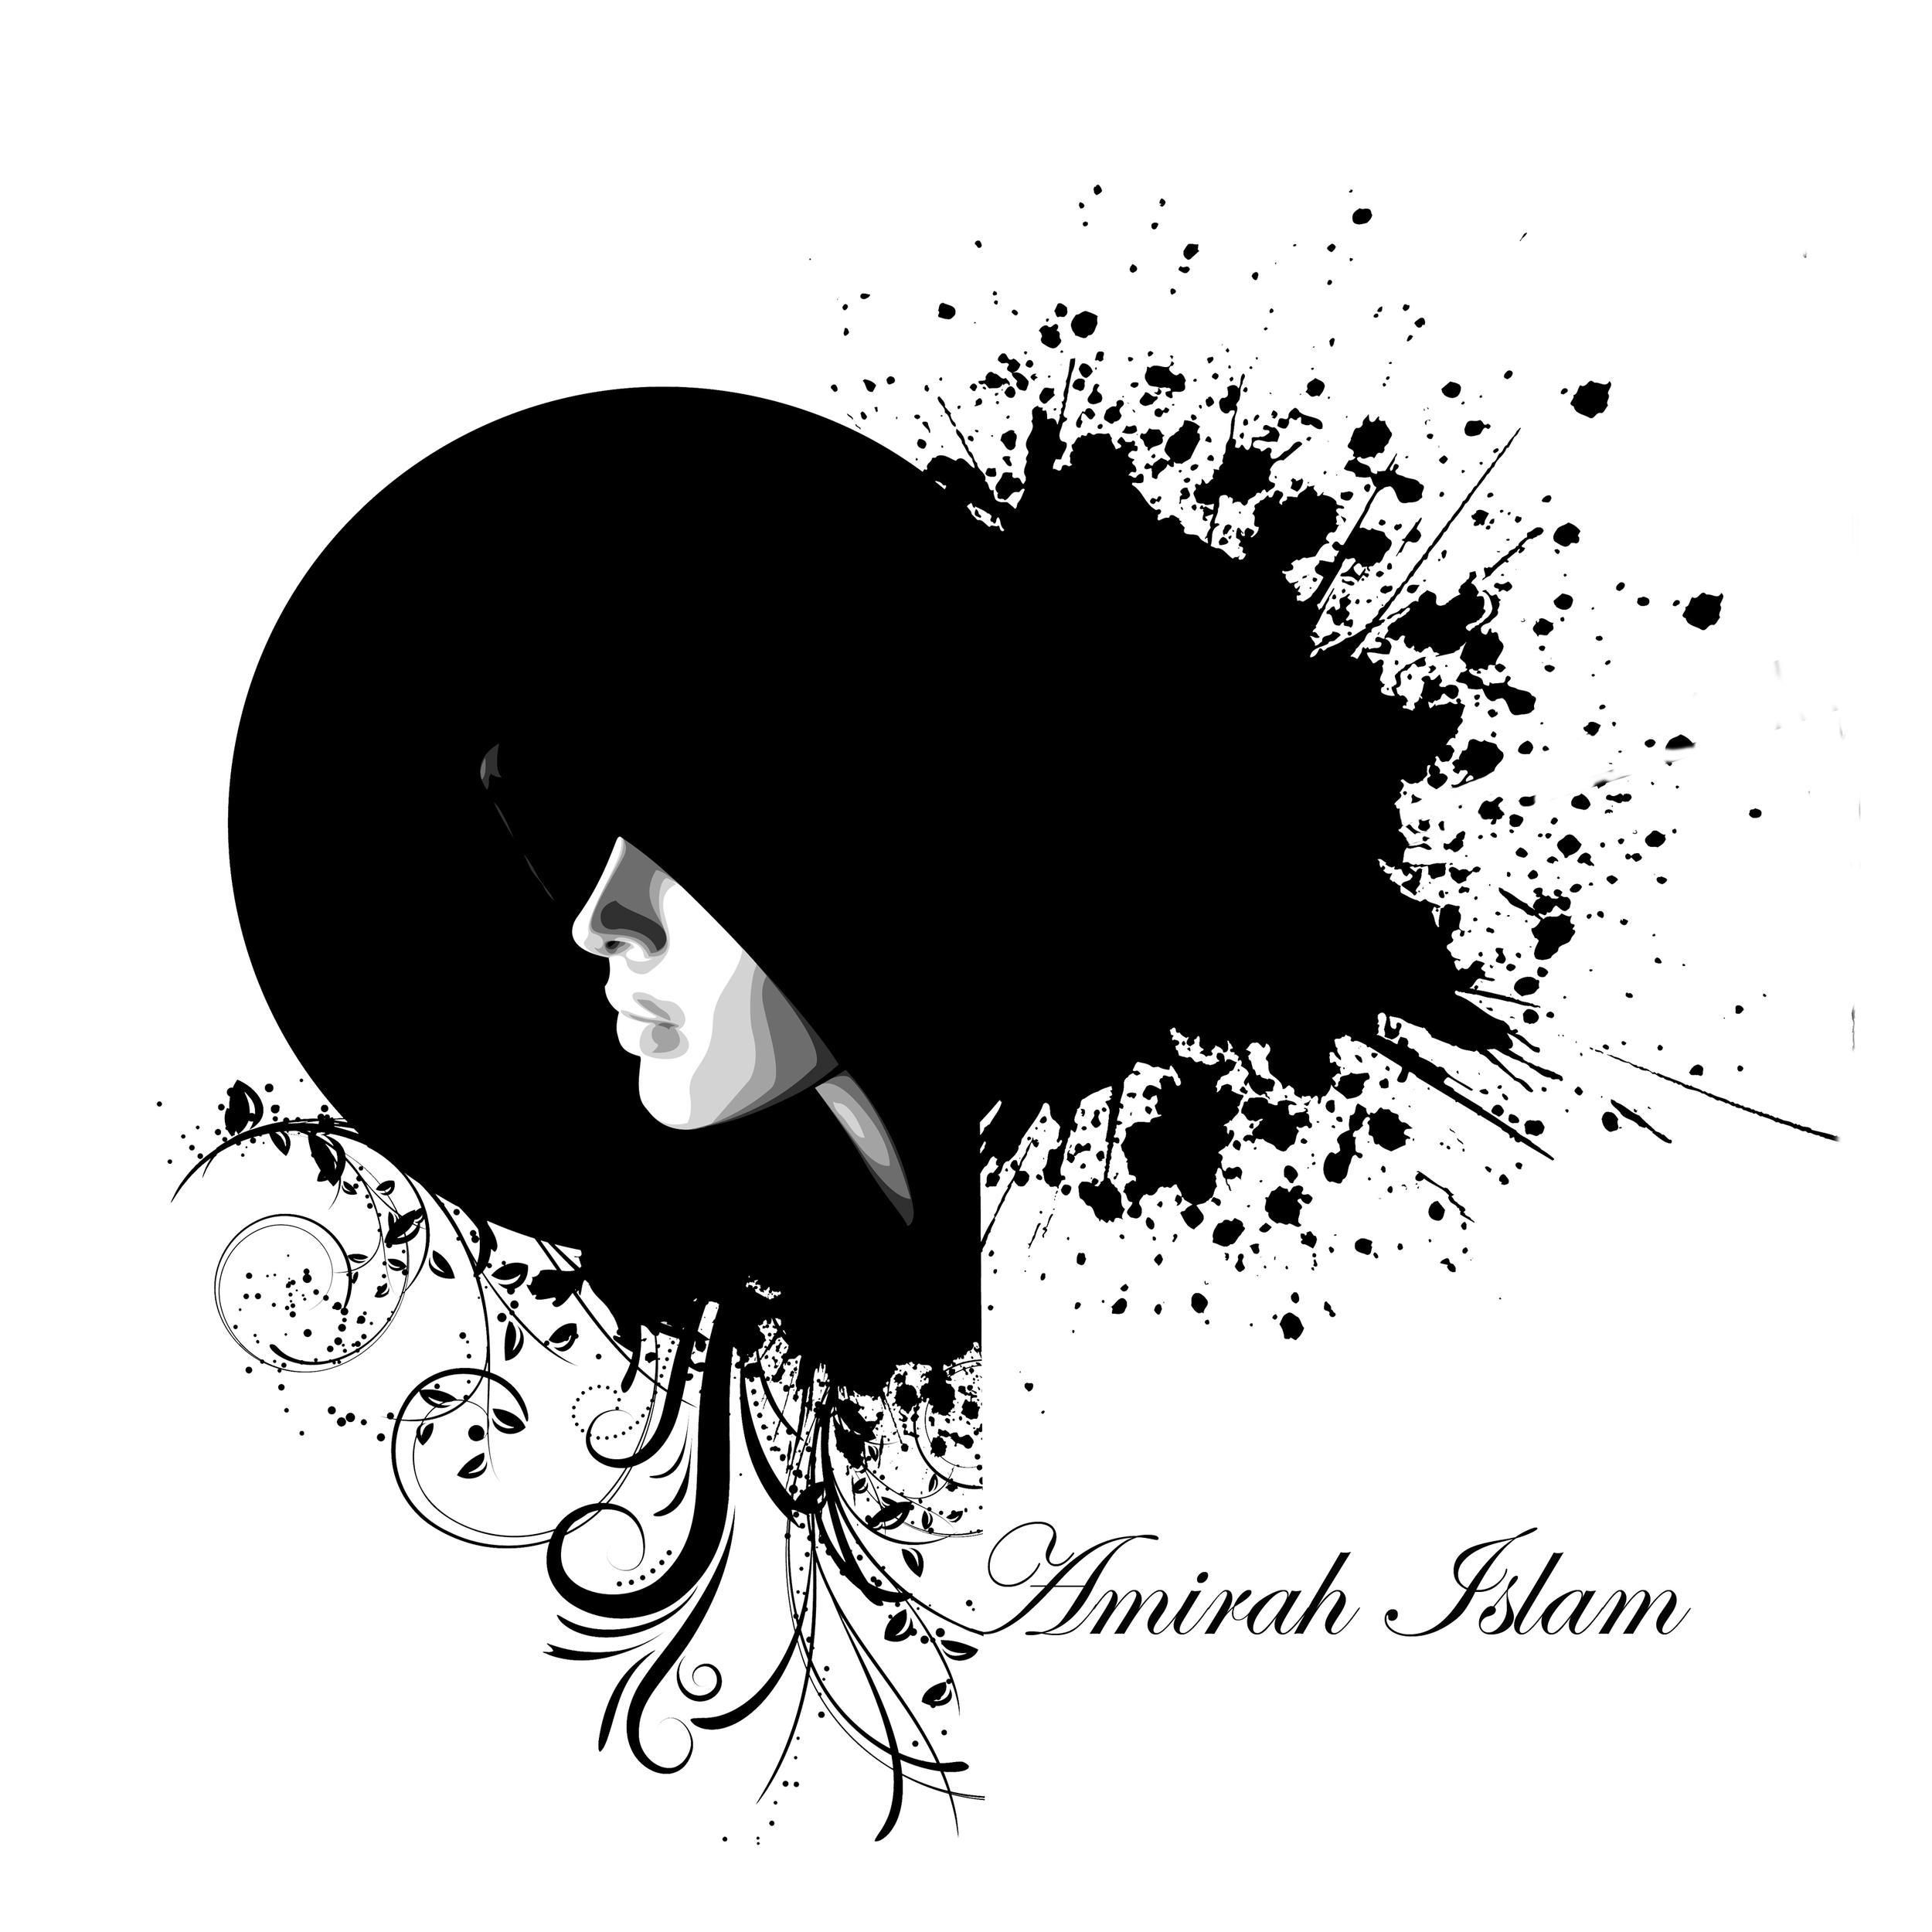 Logo Black AmirahIslam.jpg